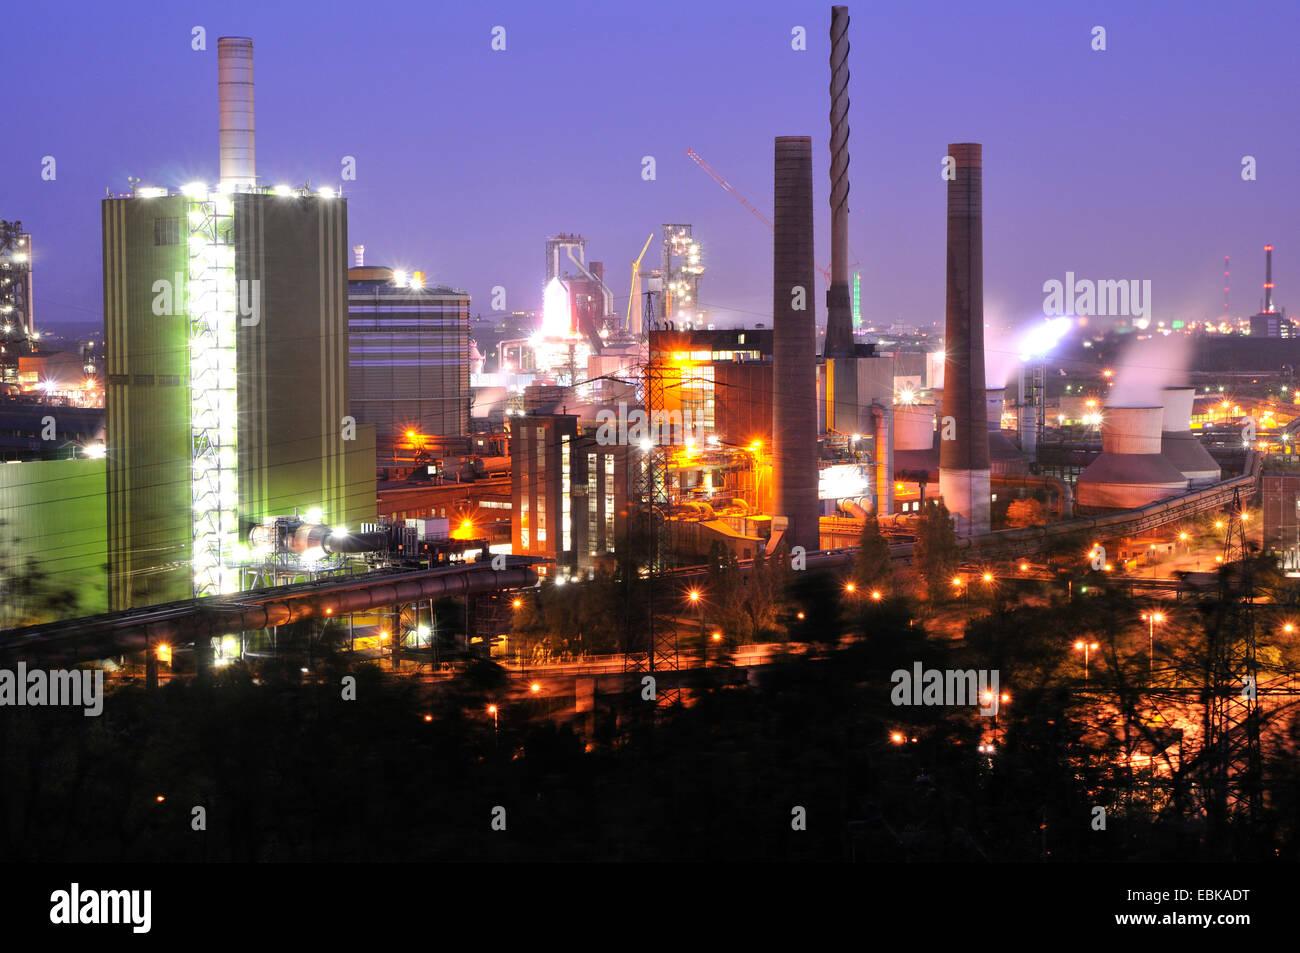 heavy industry near Duisburg-Meiderich at night, Germany, North Rhine-Westphalia, Ruhr Area, Duisburg - Stock Image